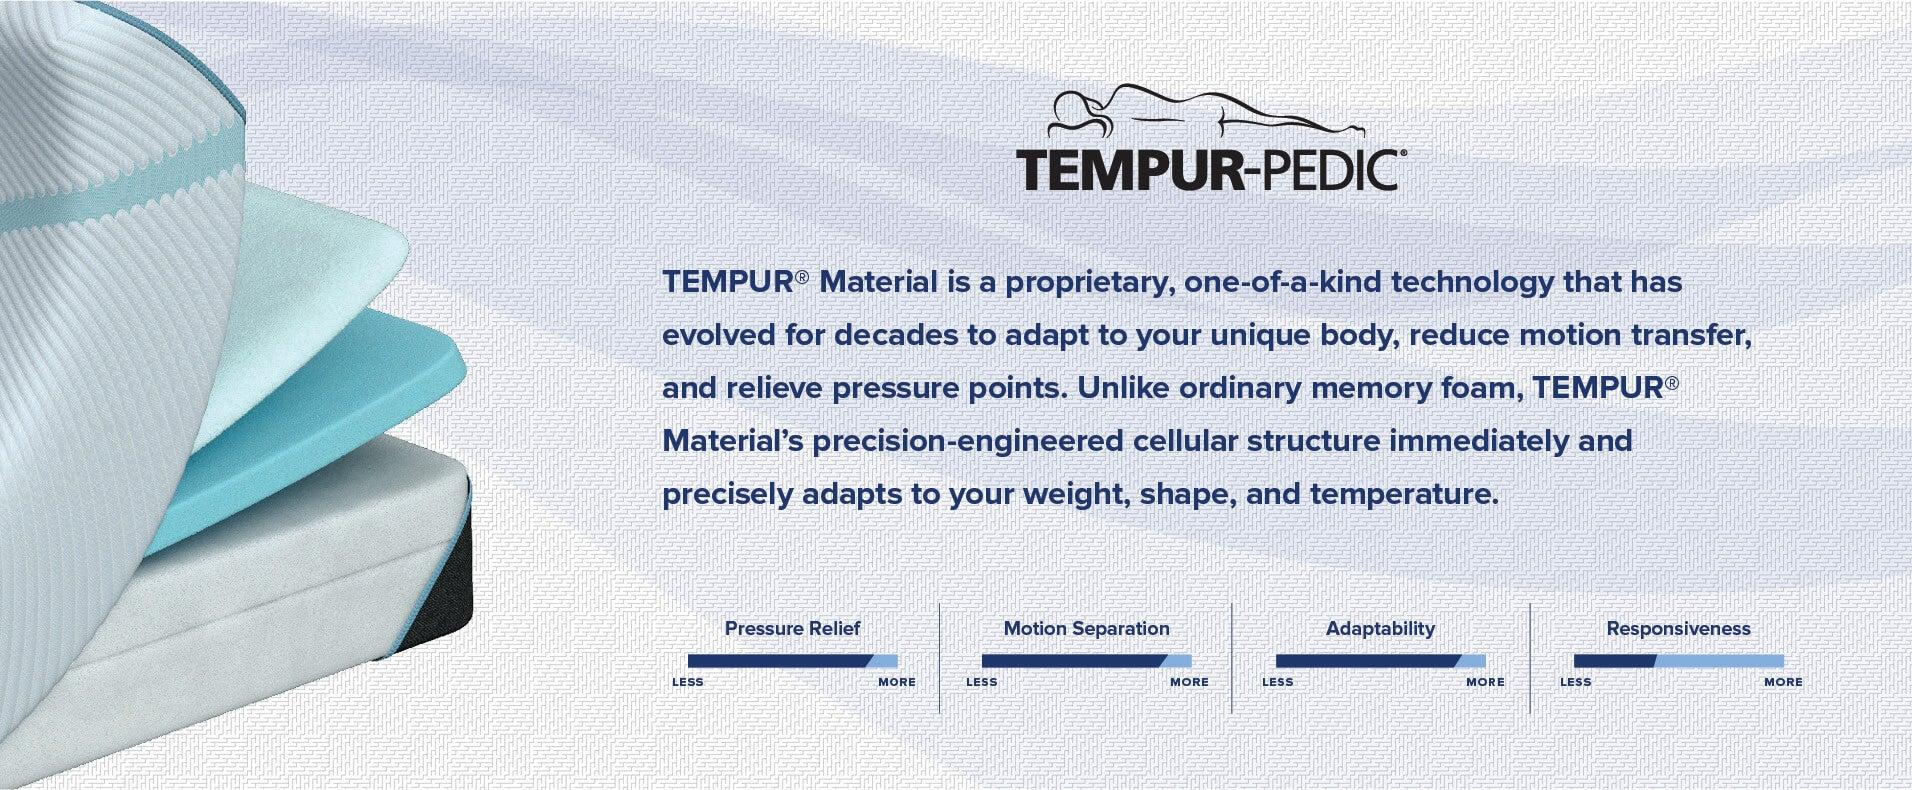 Sleep Smarter Tempur-Pedic